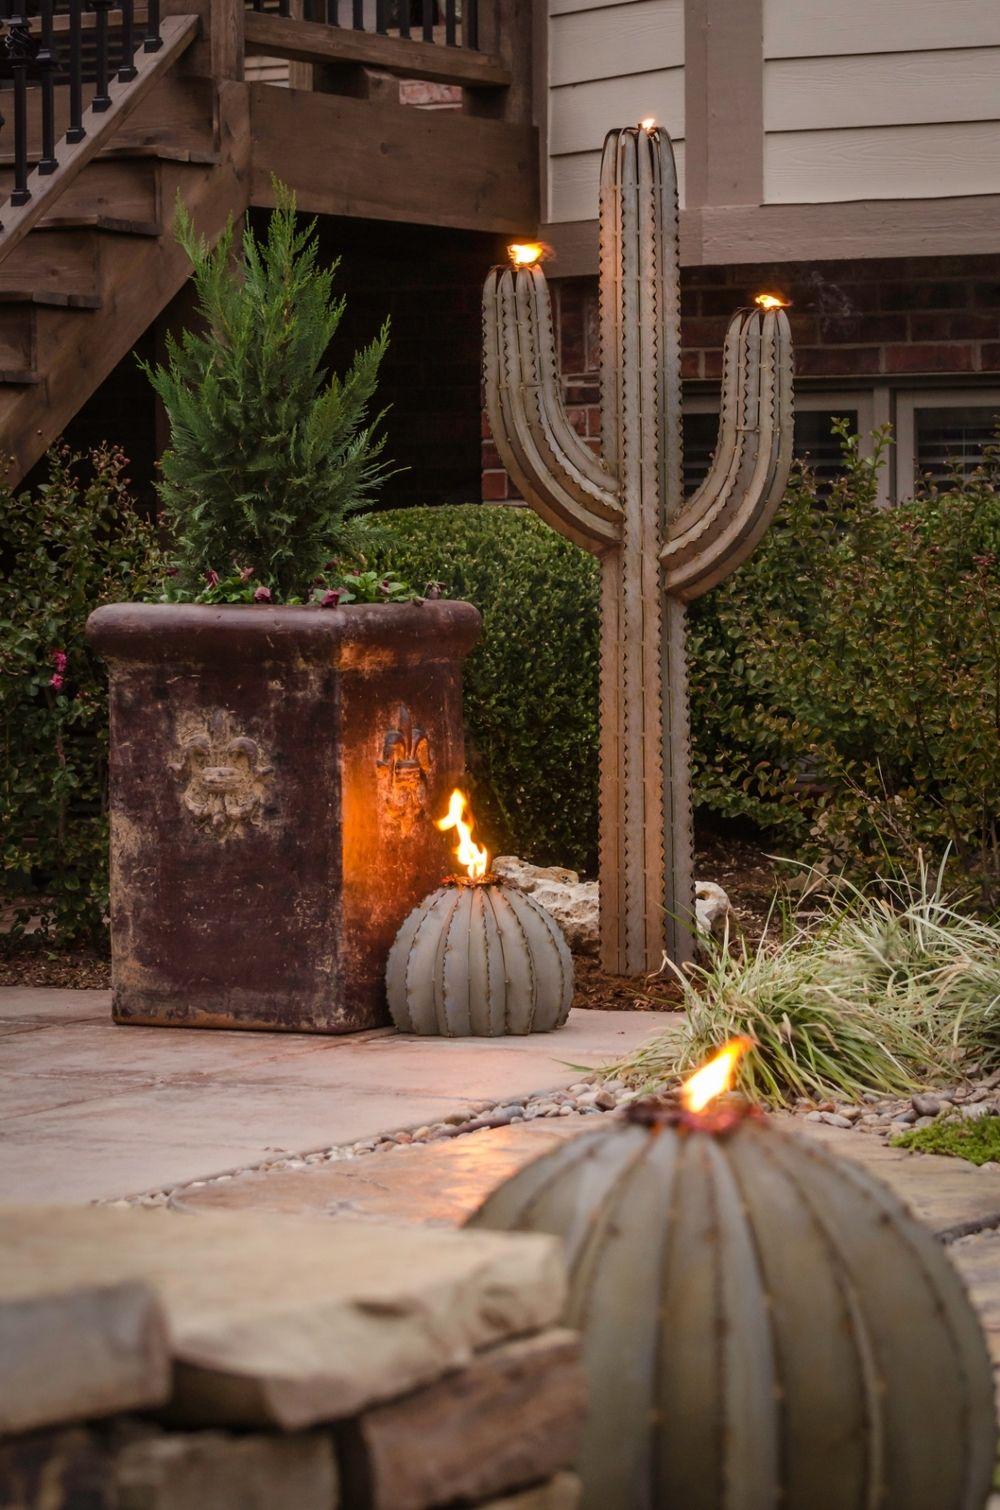 Golden Barrel Cactus Torch By Two Arm Cactus Outdoor Patio